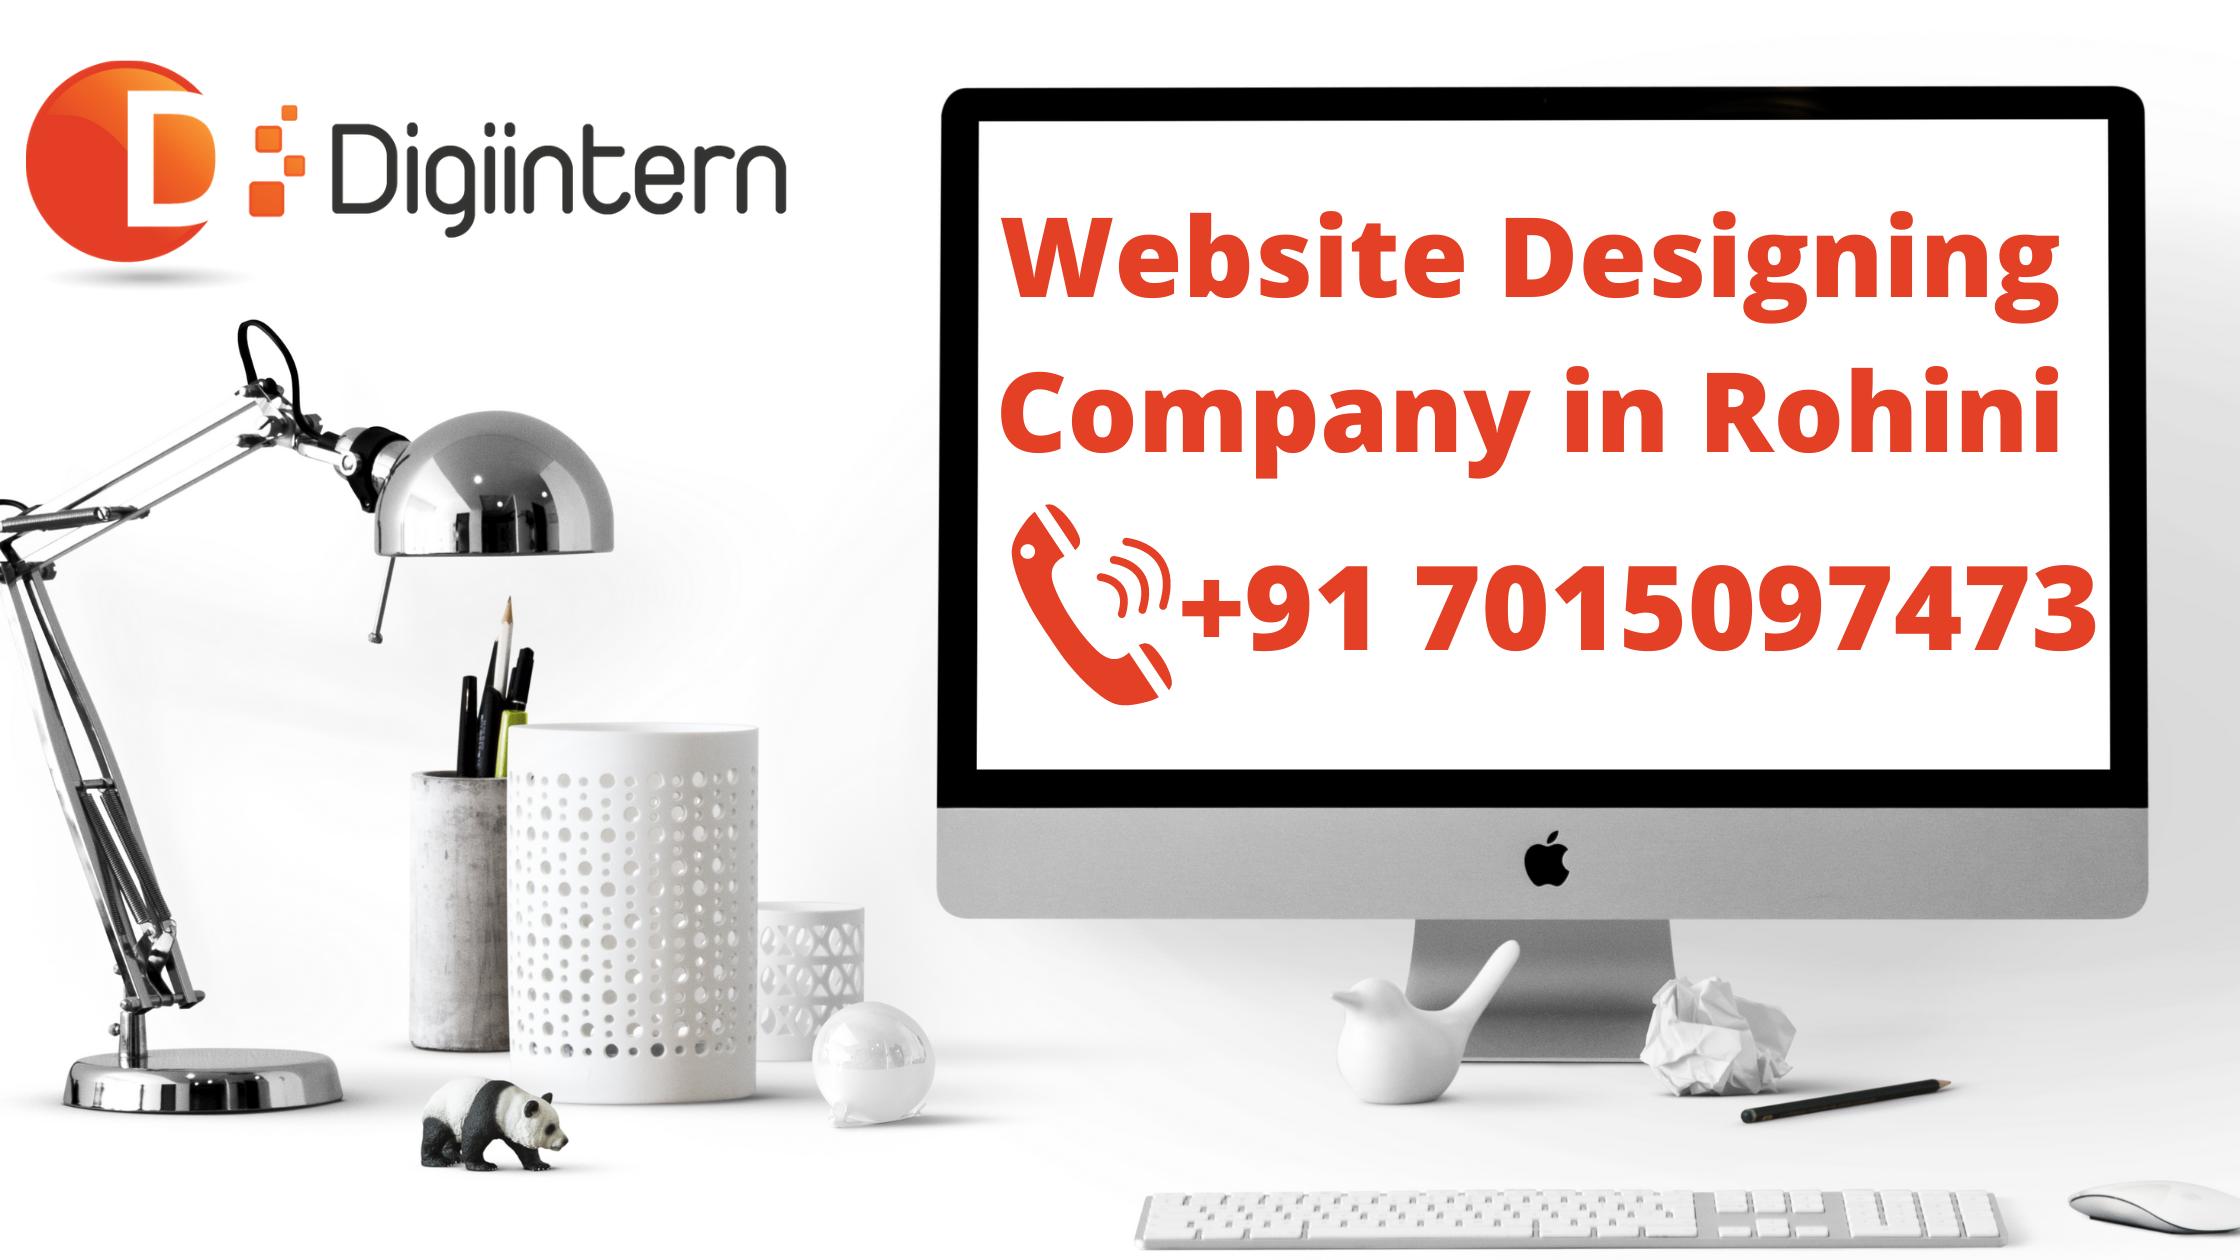 Website Designing Company in Rohini